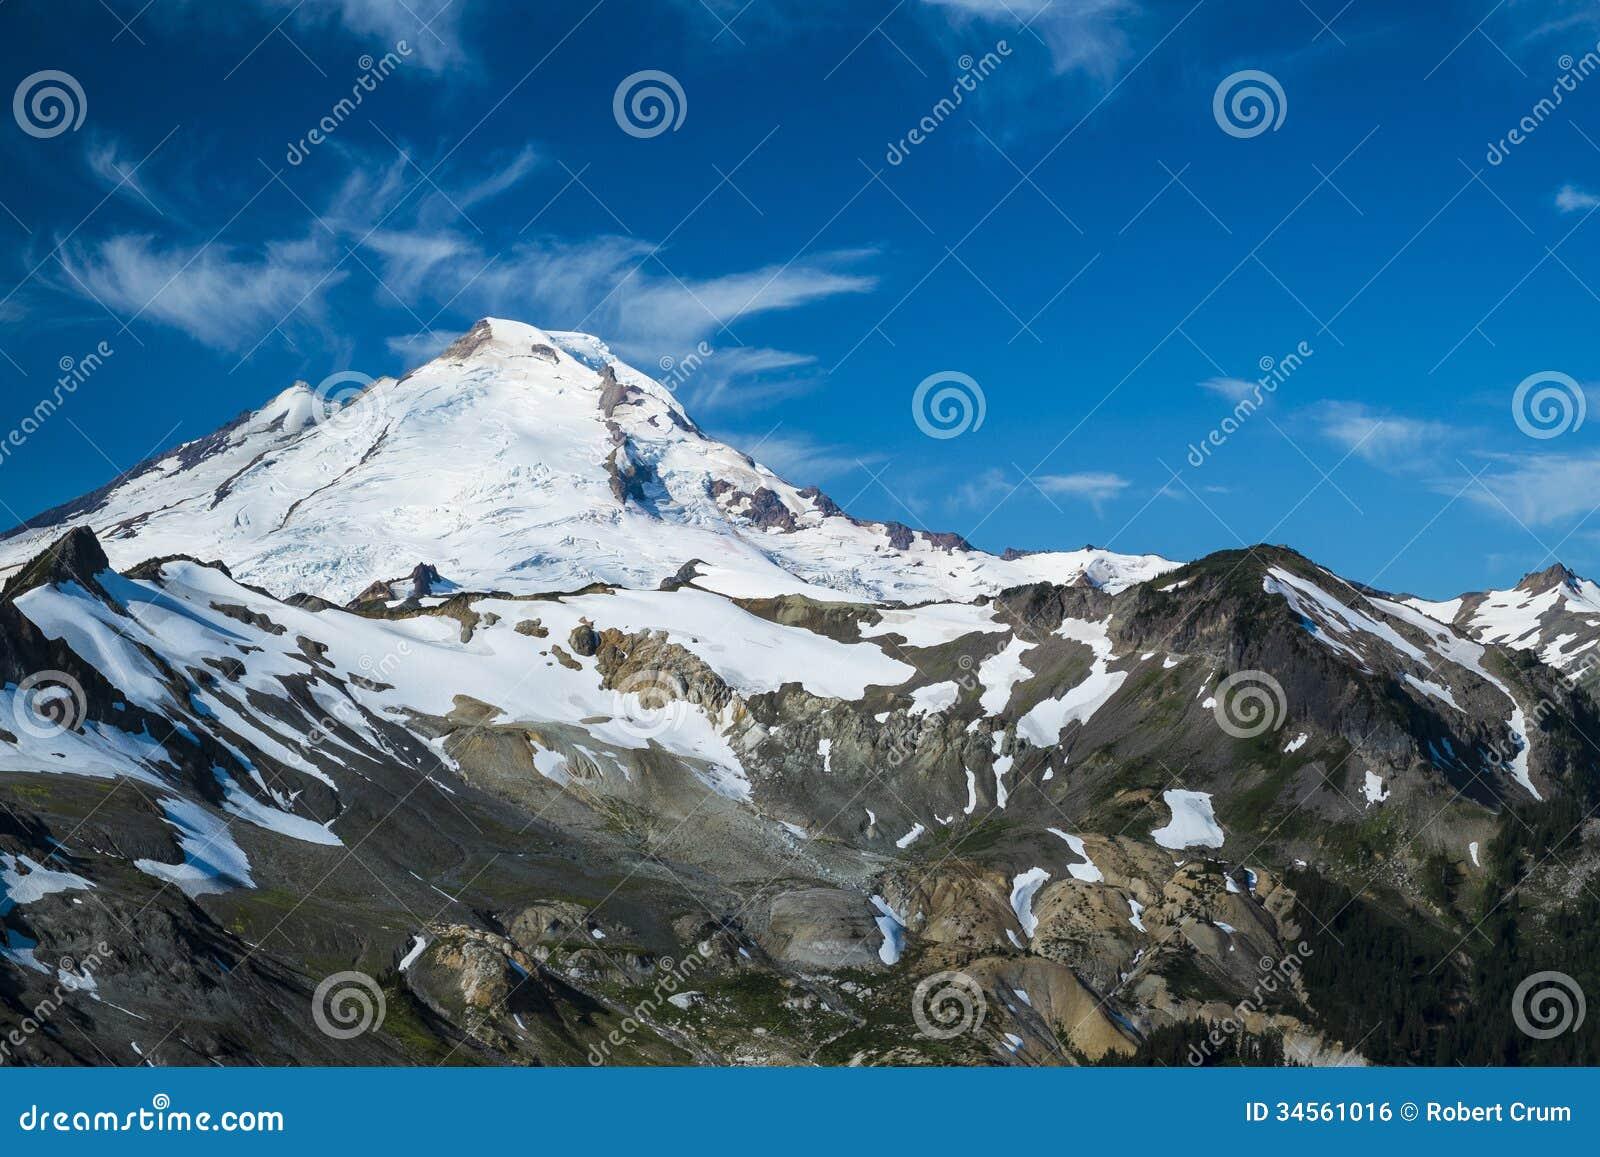 Snowcapped Imágenes De Stock Snowcapped Fotos De Stock: Snowcapped Mount Baker Under High Cirrus Clouds Royalty